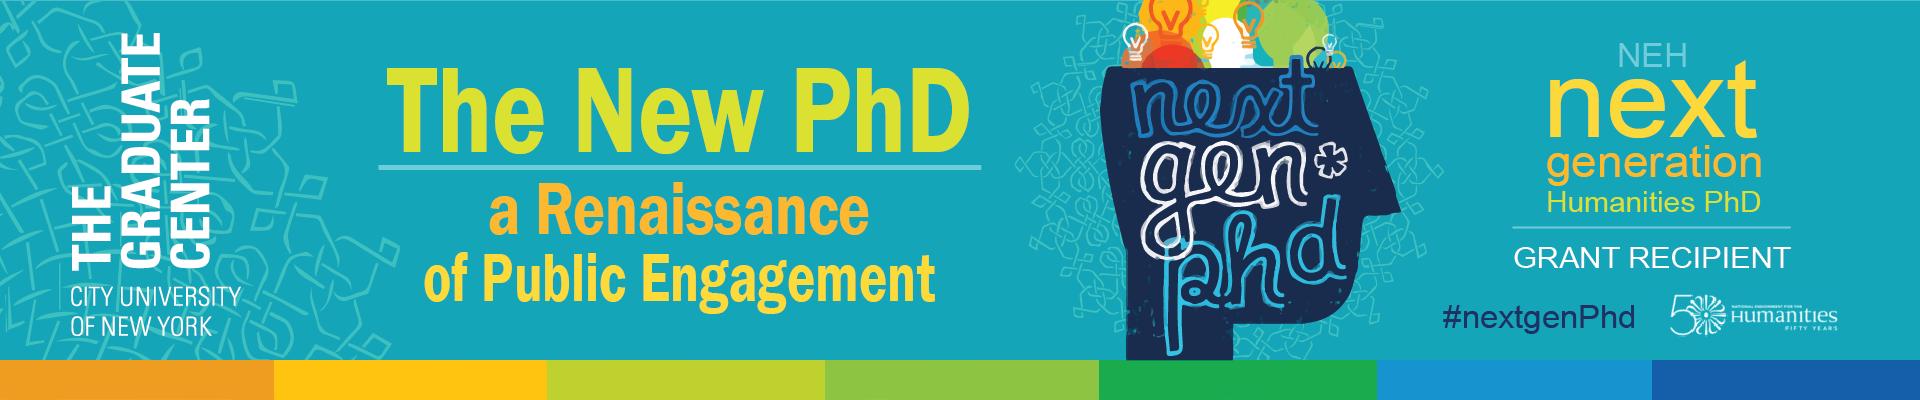 The New PhD: A Renaissance of Public Engagement